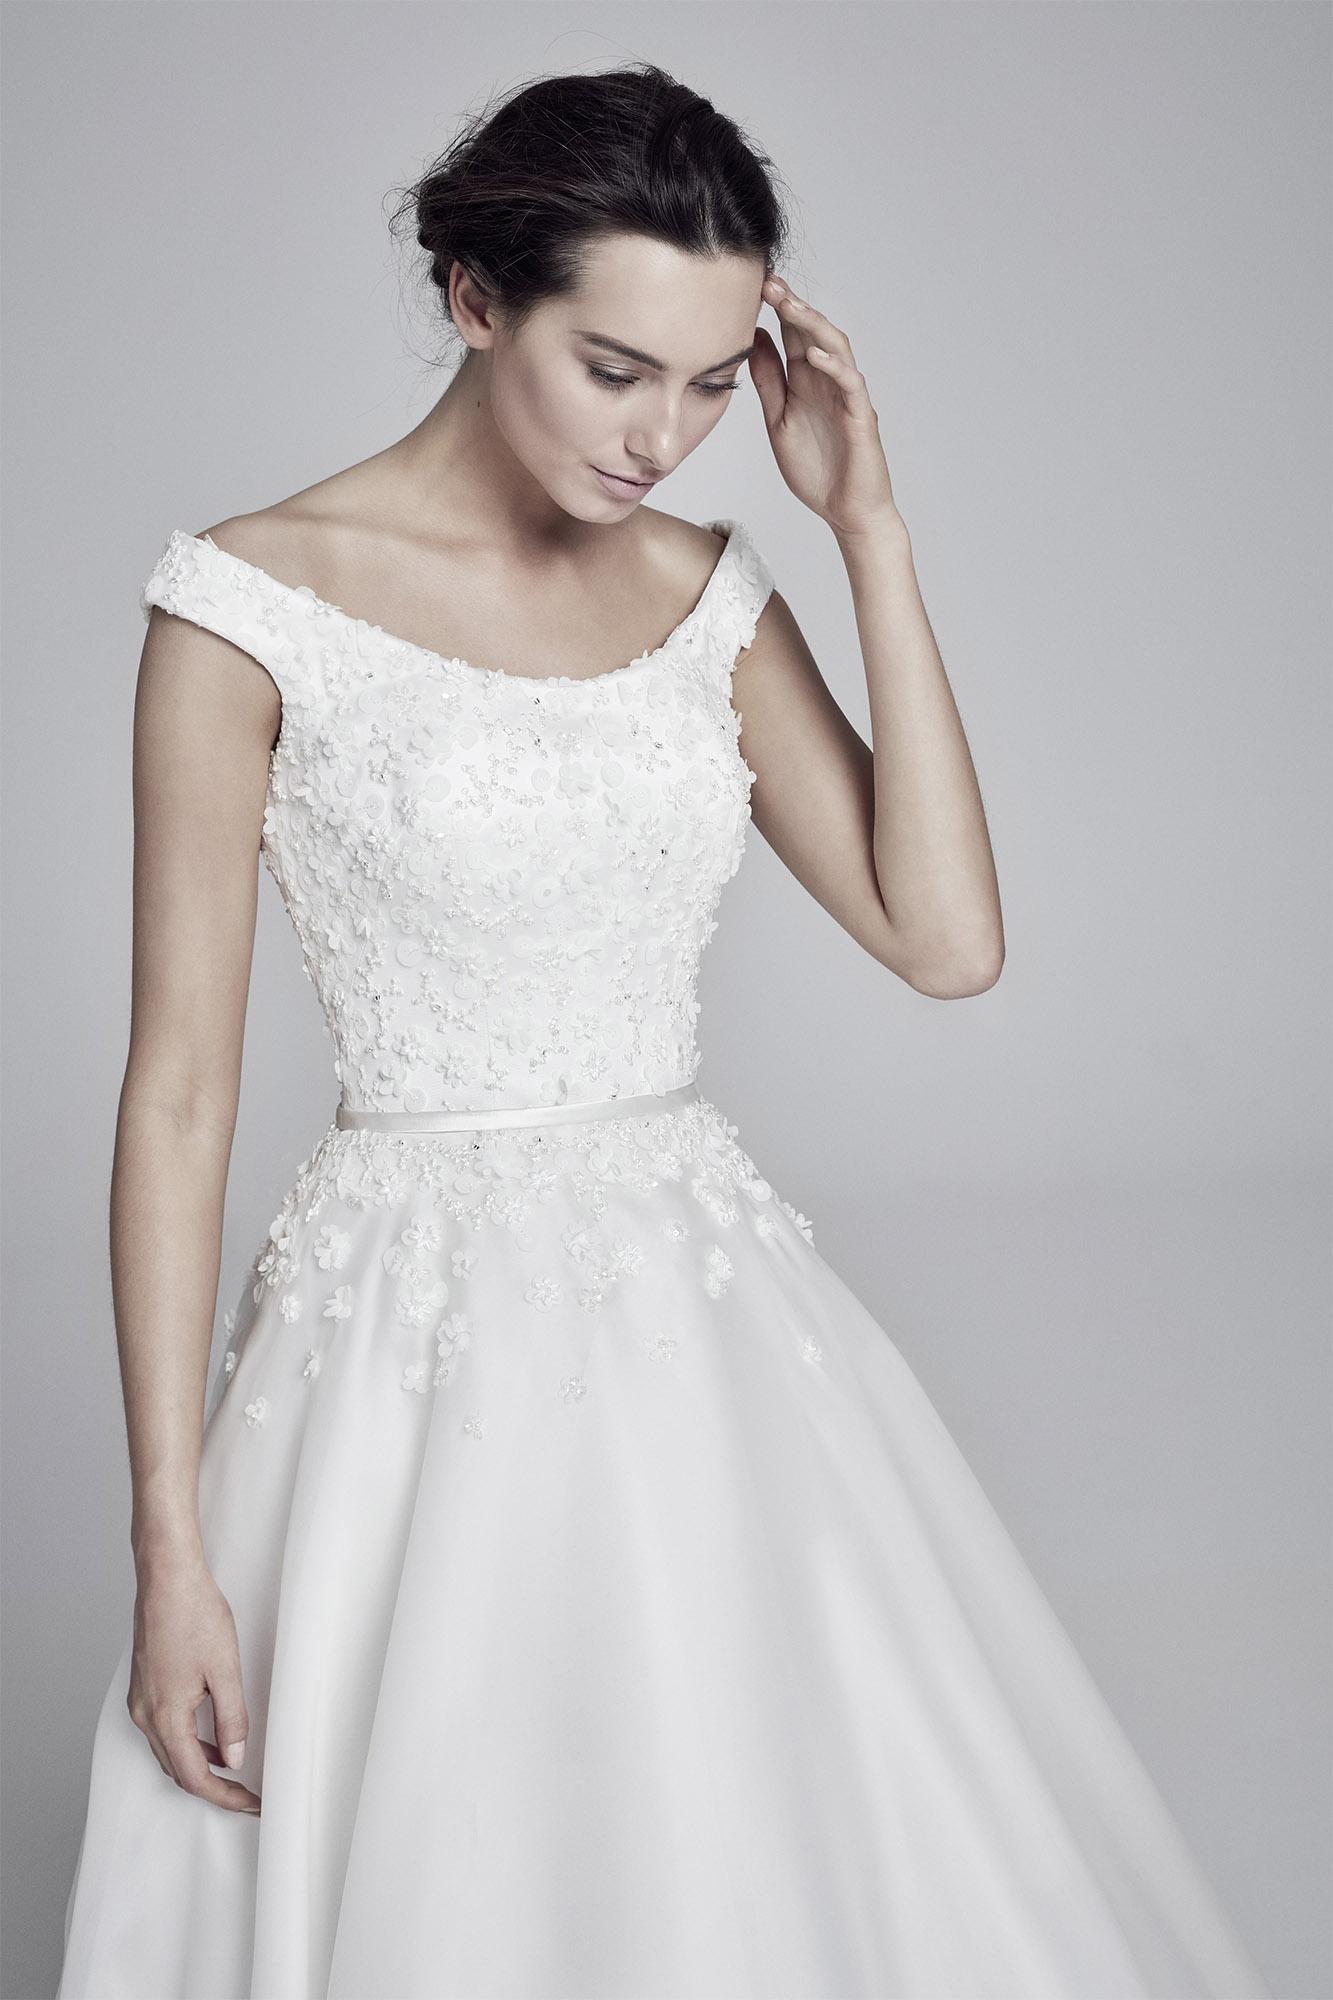 Floriana  Collections 2019 Lookbook  UK designer wedding dresses